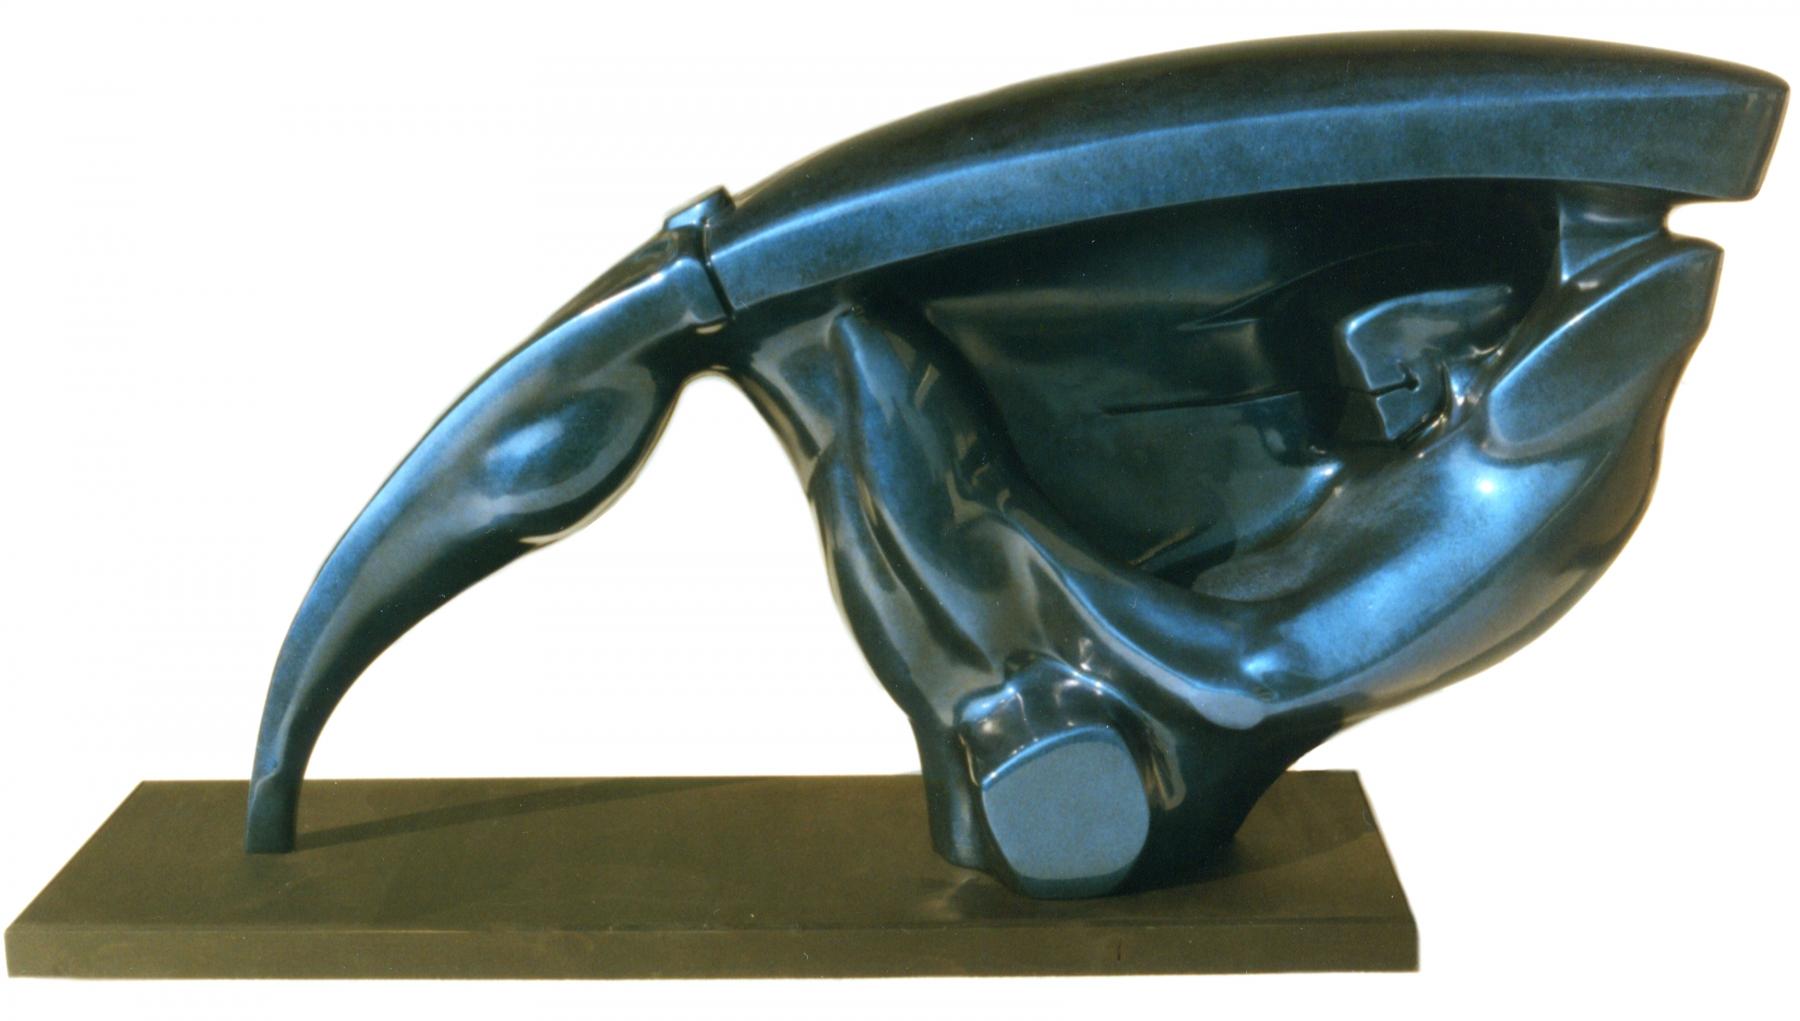 RIFUGIO- Vetroresina- 120x80x60-1997